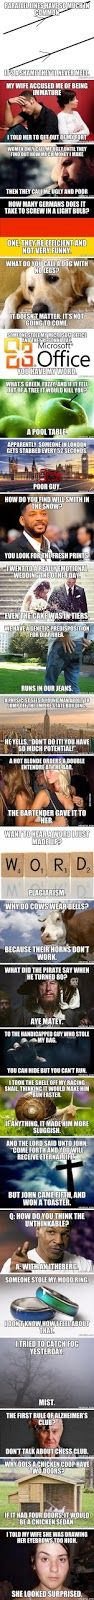 World's Funniest Two-liner Jokes